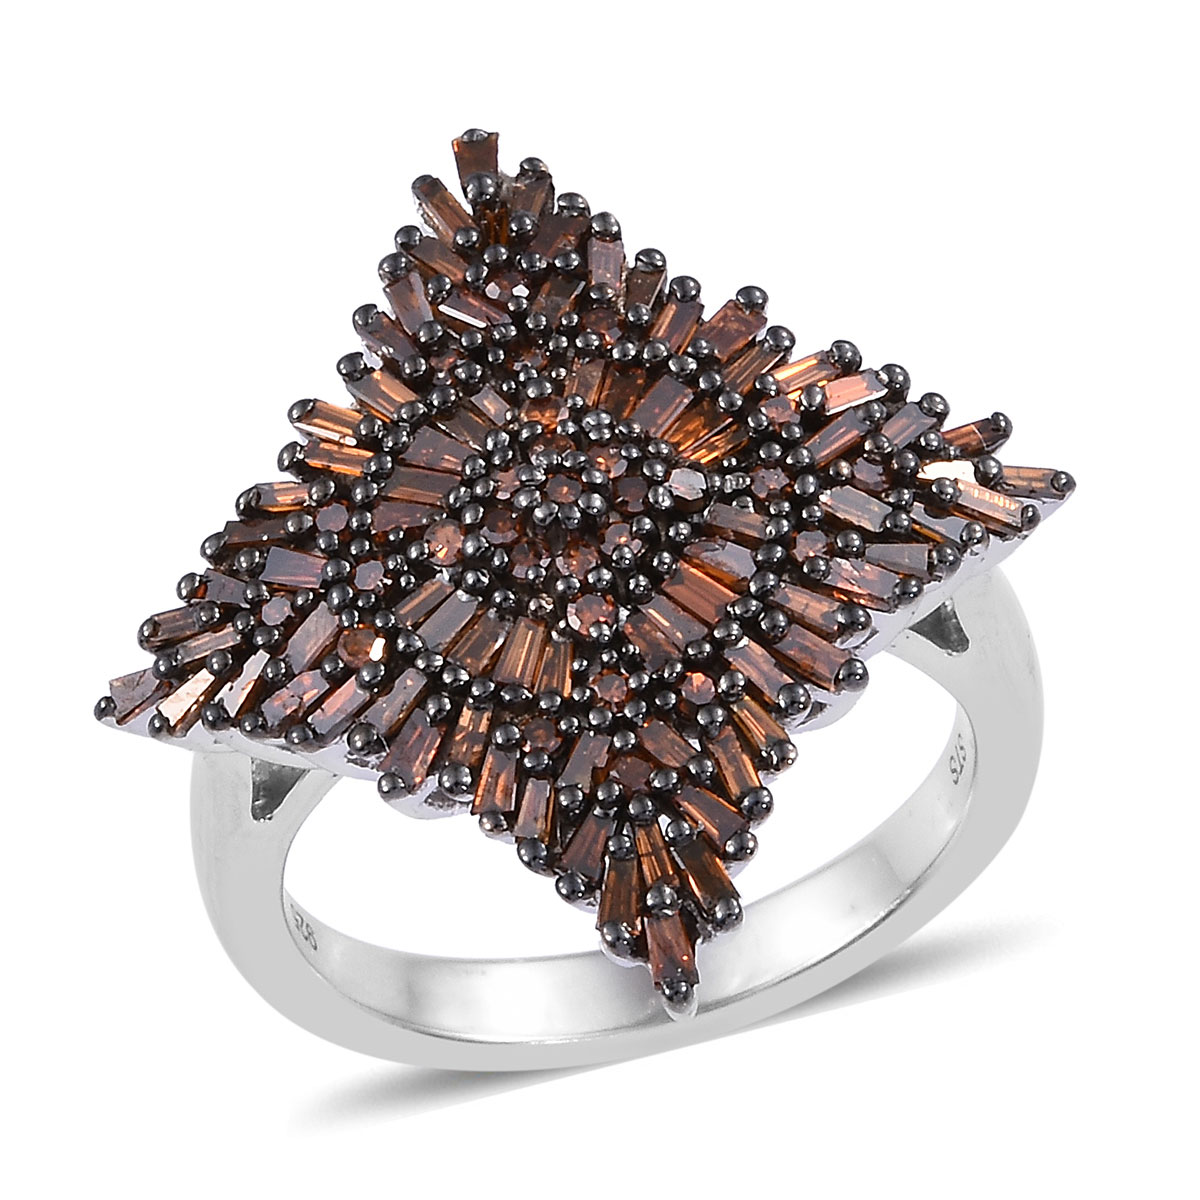 Array - tlv red diamond  ir  ring in black rhodium  u0026 platinum over sterling silver  size 8 0  1 00 ctw  rh   shoplc com